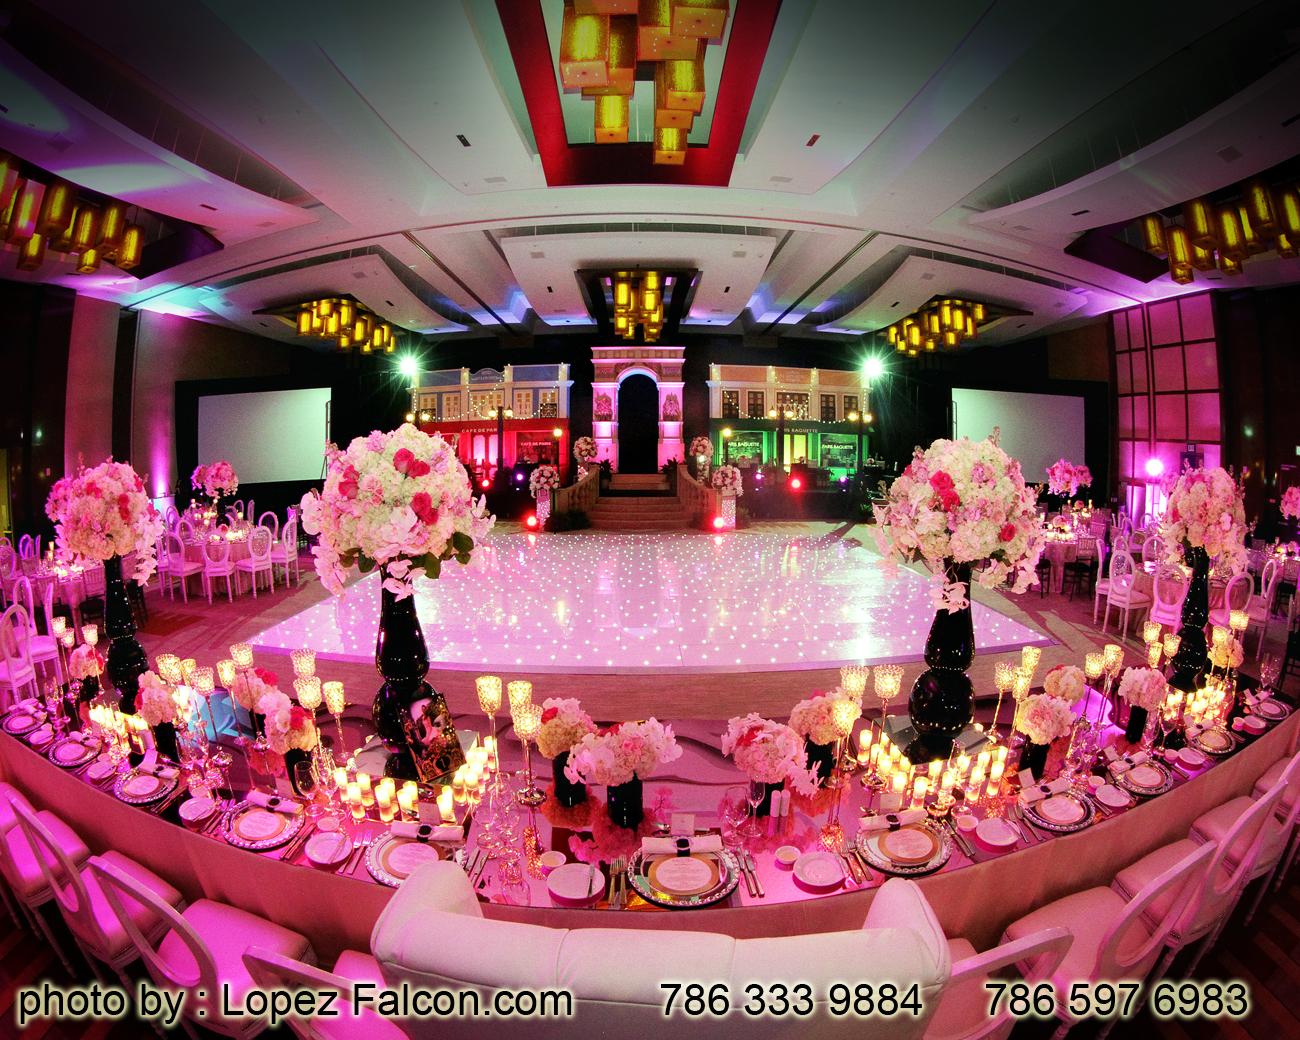 e9c60f7b468 ... France Quince Party Location   JW Marriott Marquis Miami Florida USA  Paris themed Quinceanera centerpieces Paris quinceanera theme Paris  quinceanera ...